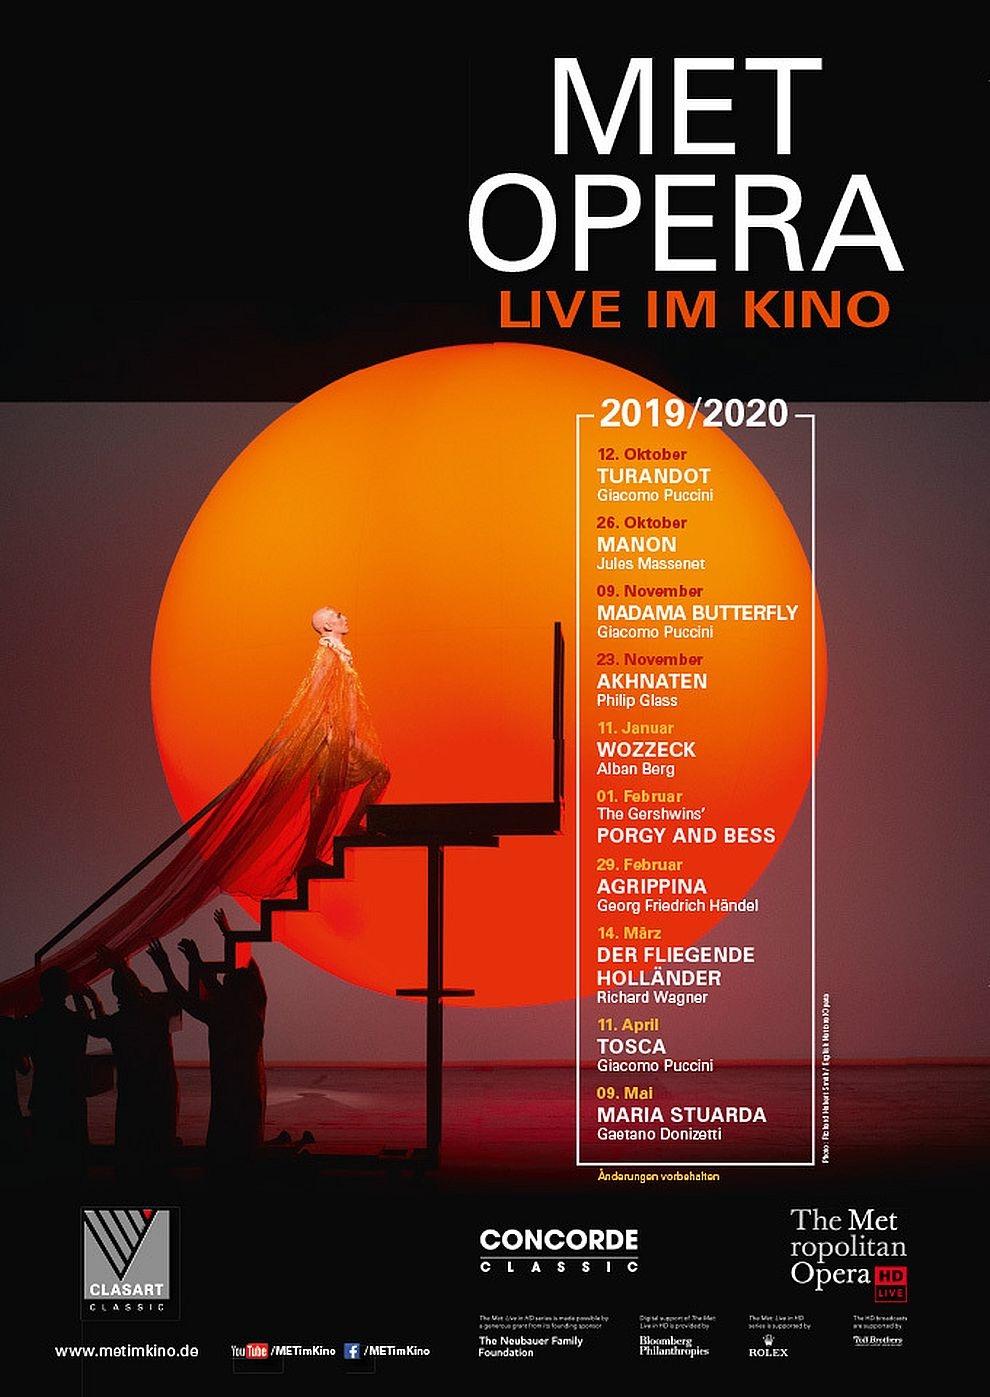 Met Opera 2019/20: Agrippina (Händel) (Poster)